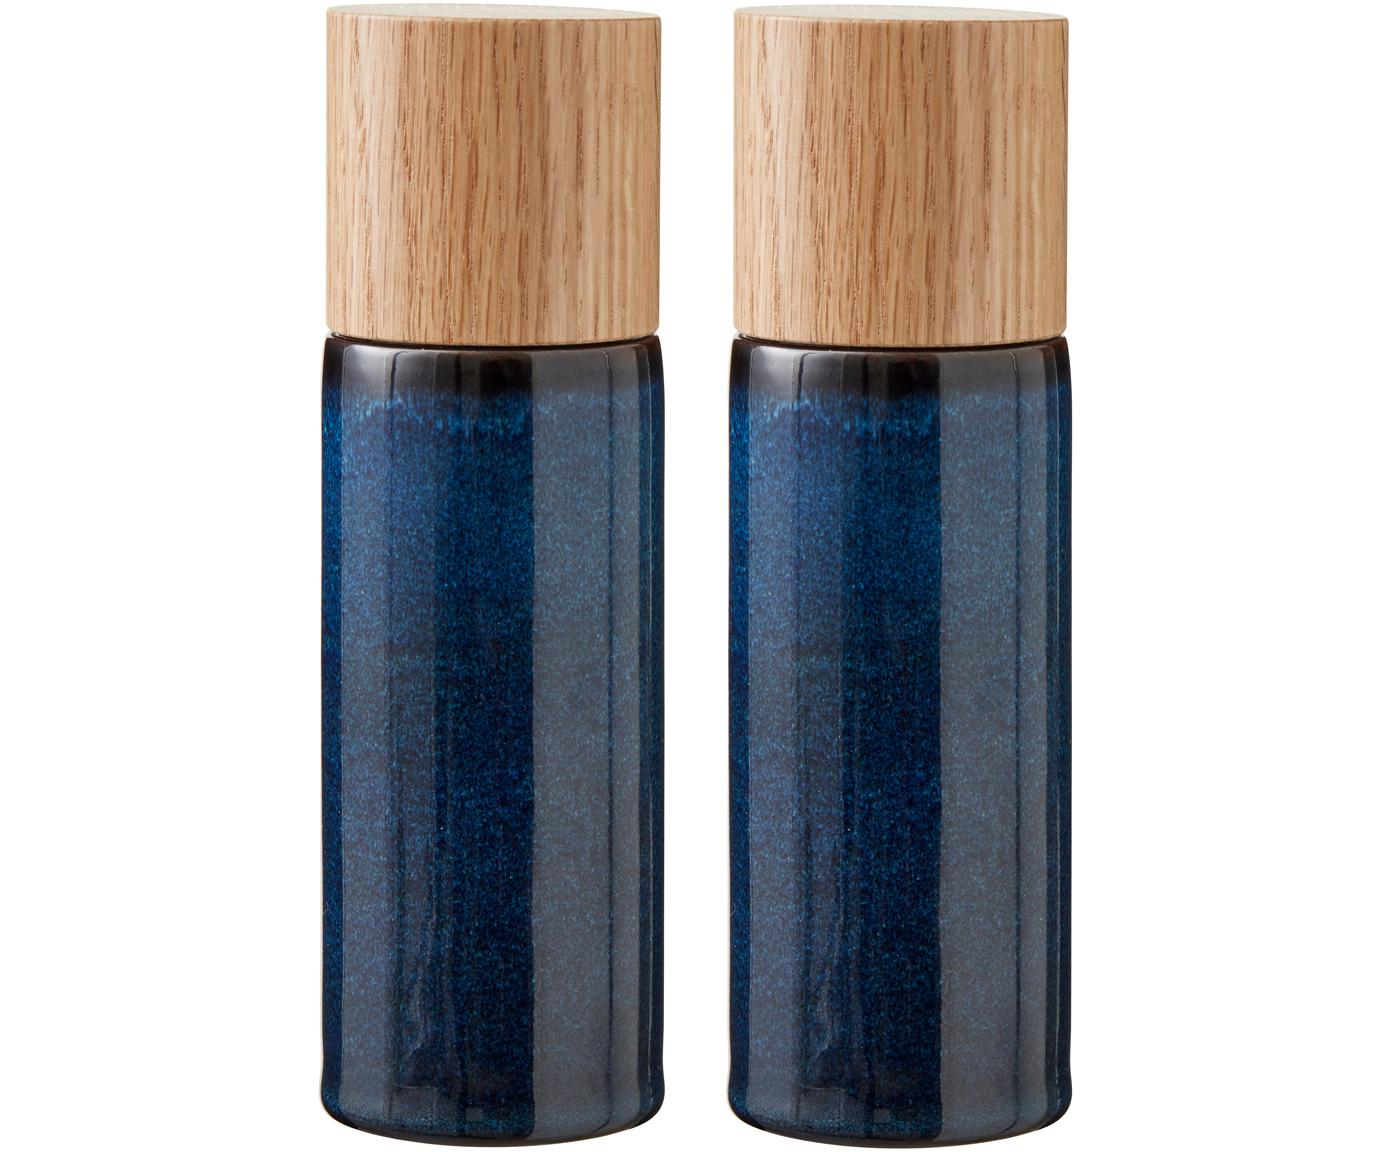 Zout- en peperstrooier-set Bizz, 2-delig, Deksel: hout, Donkerblauw, bruin, hout, Ø 5 x H 17 cm